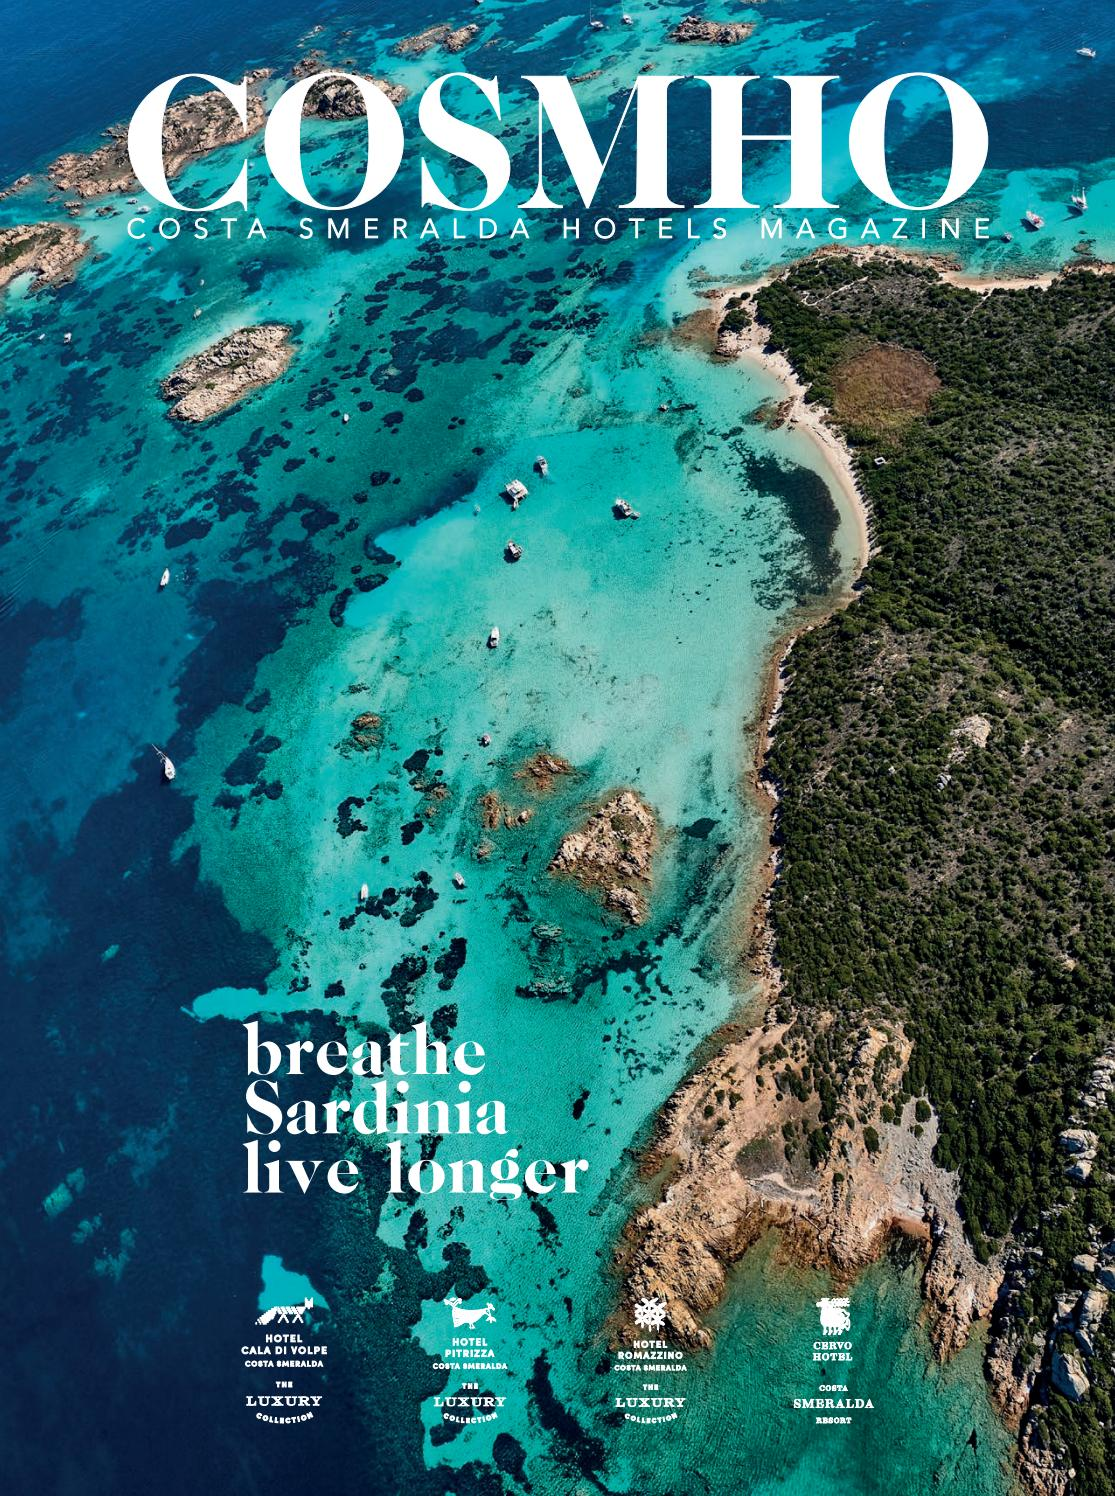 Cosmho 2017 - Costa Smeralda Hotels Magazine by Gruppo Editoriale srl -  issuu 7d43ead5c9c3